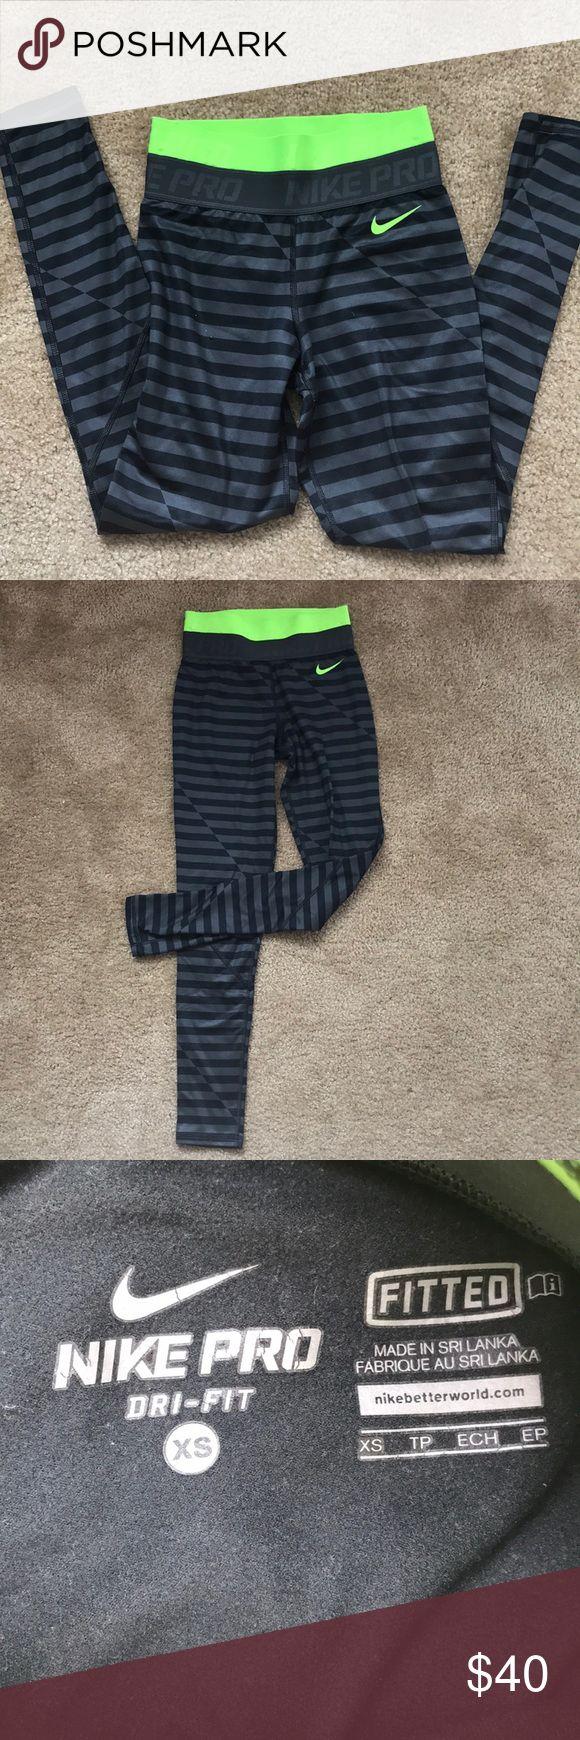 Nike pro leggings with neon band Size XS Great condition  Smoke/per free home Nike Pants Leggings